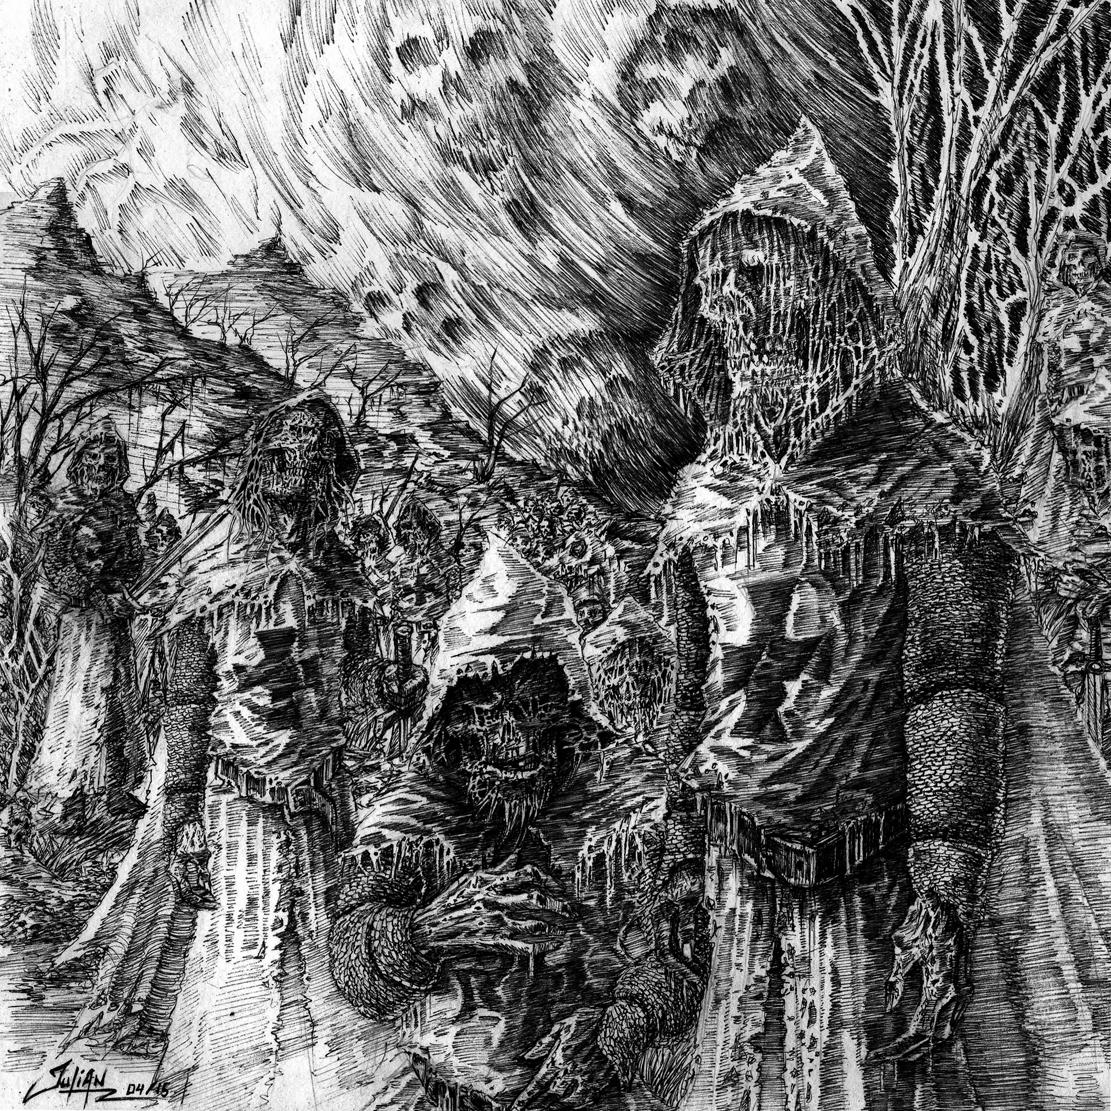 RESTOS HUMANOS / CRYPTIC BROOD split 7